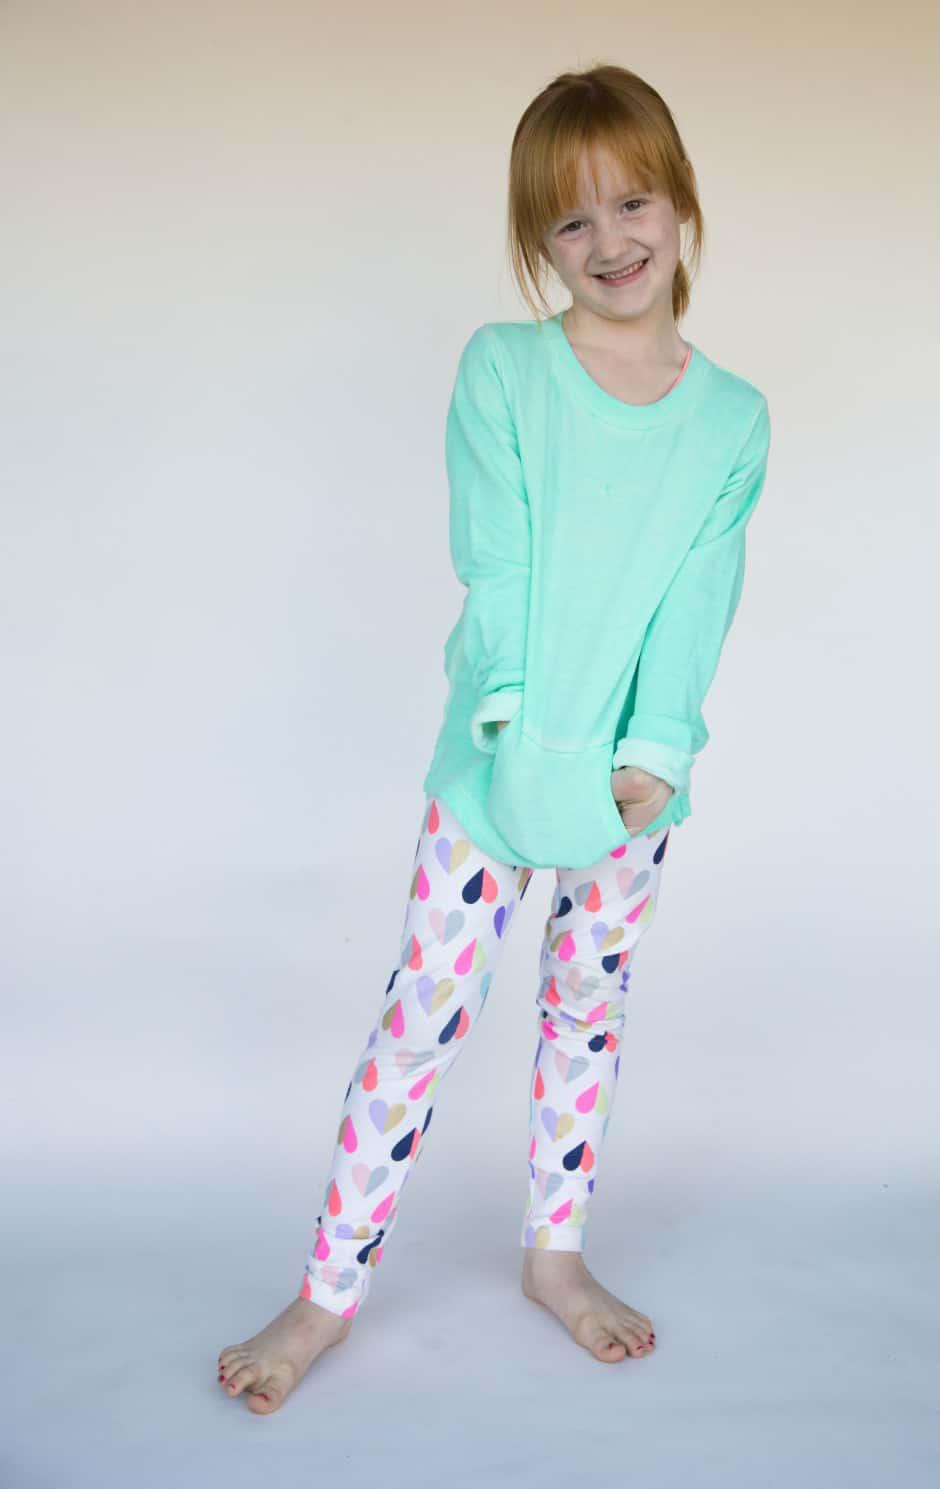 teach-children-how-to-get-dressed